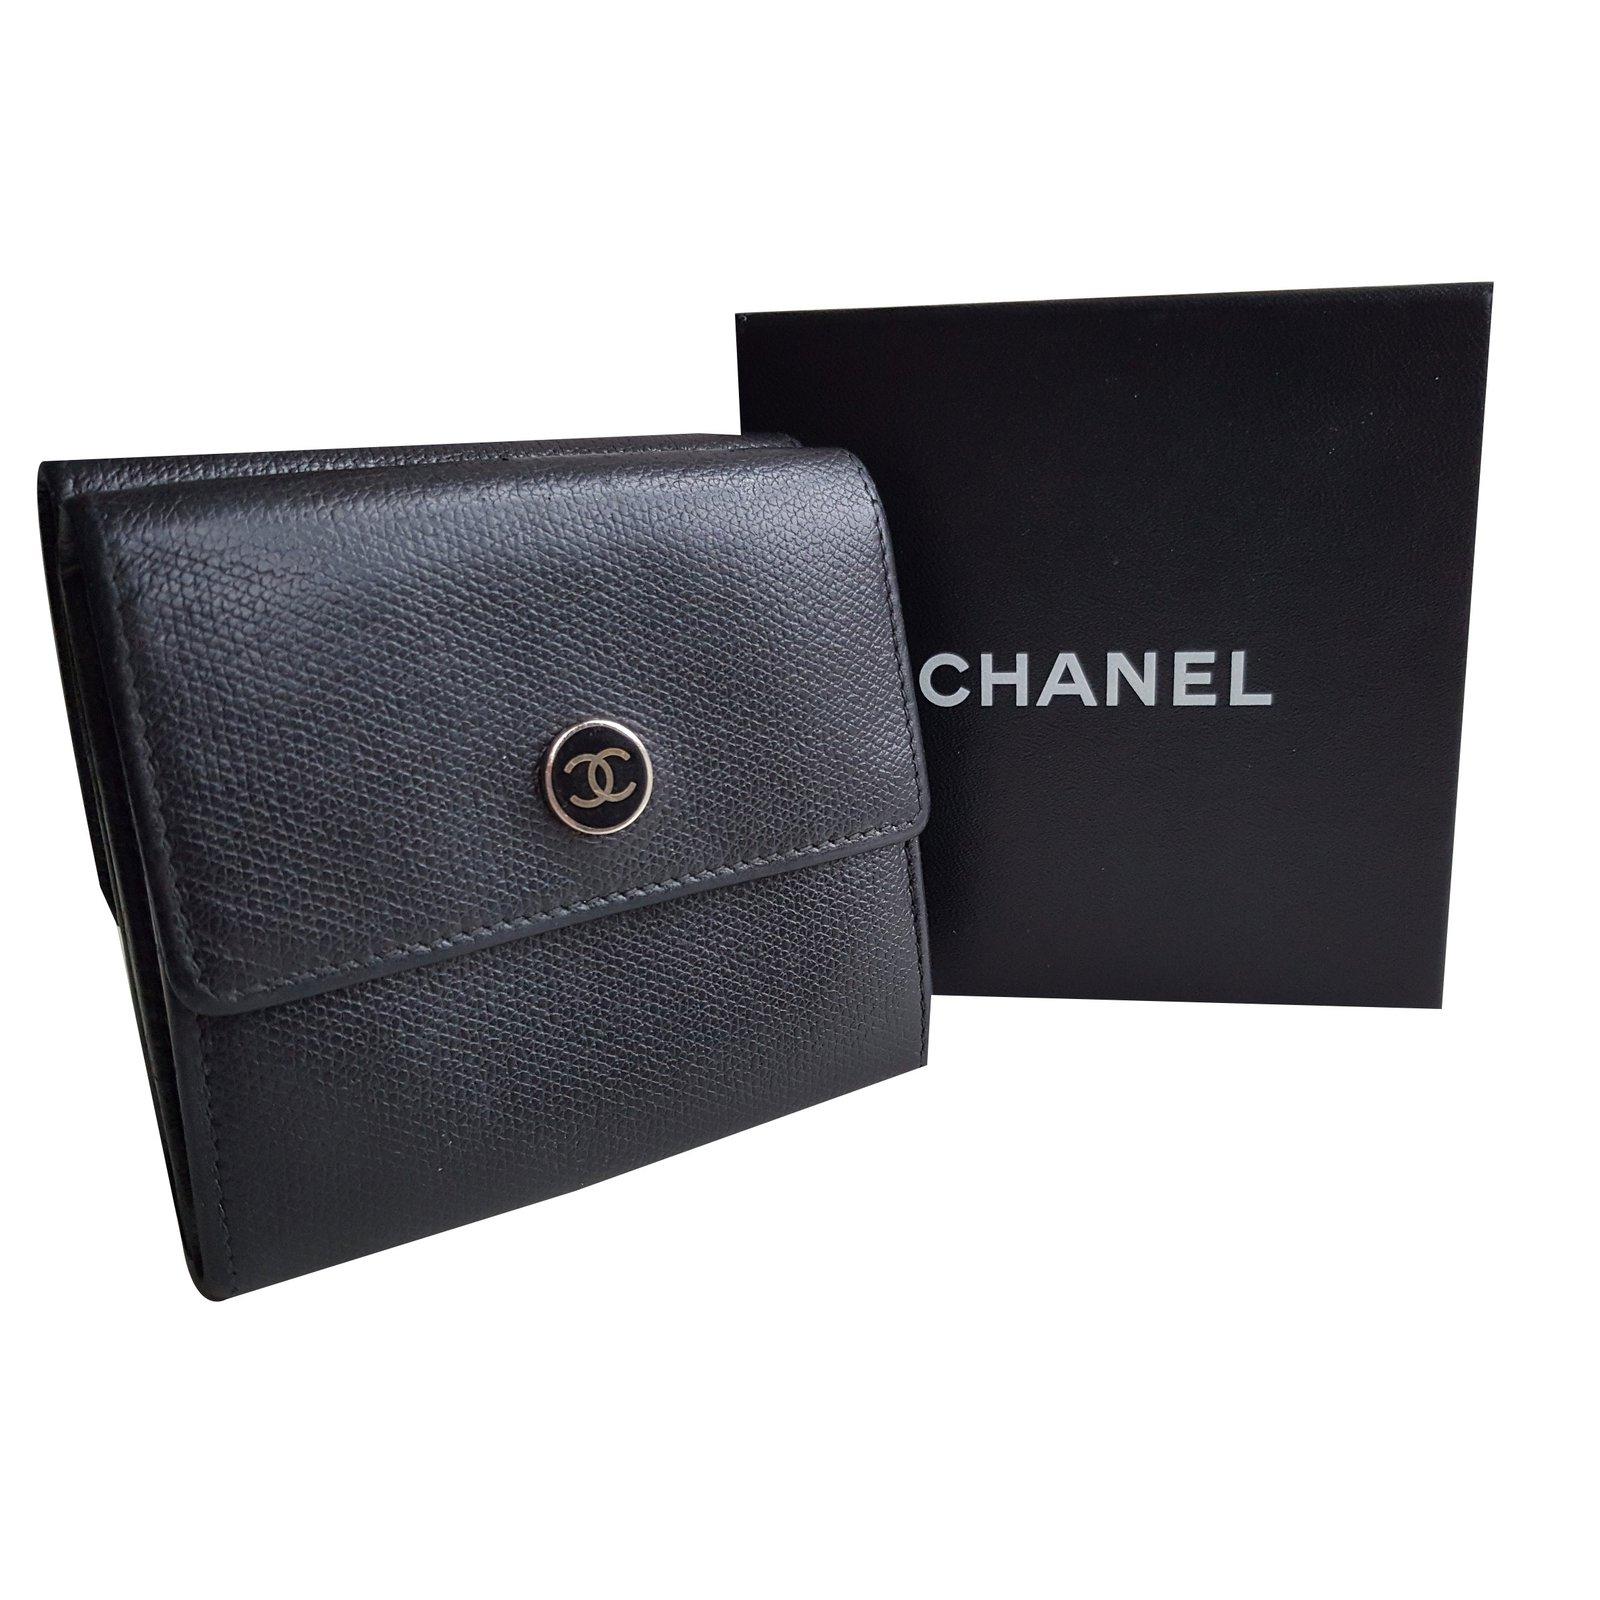 38fd60d0791 Portefeuilles Chanel Portefeuilles Cuir Noir ref.52450 - Joli Closet